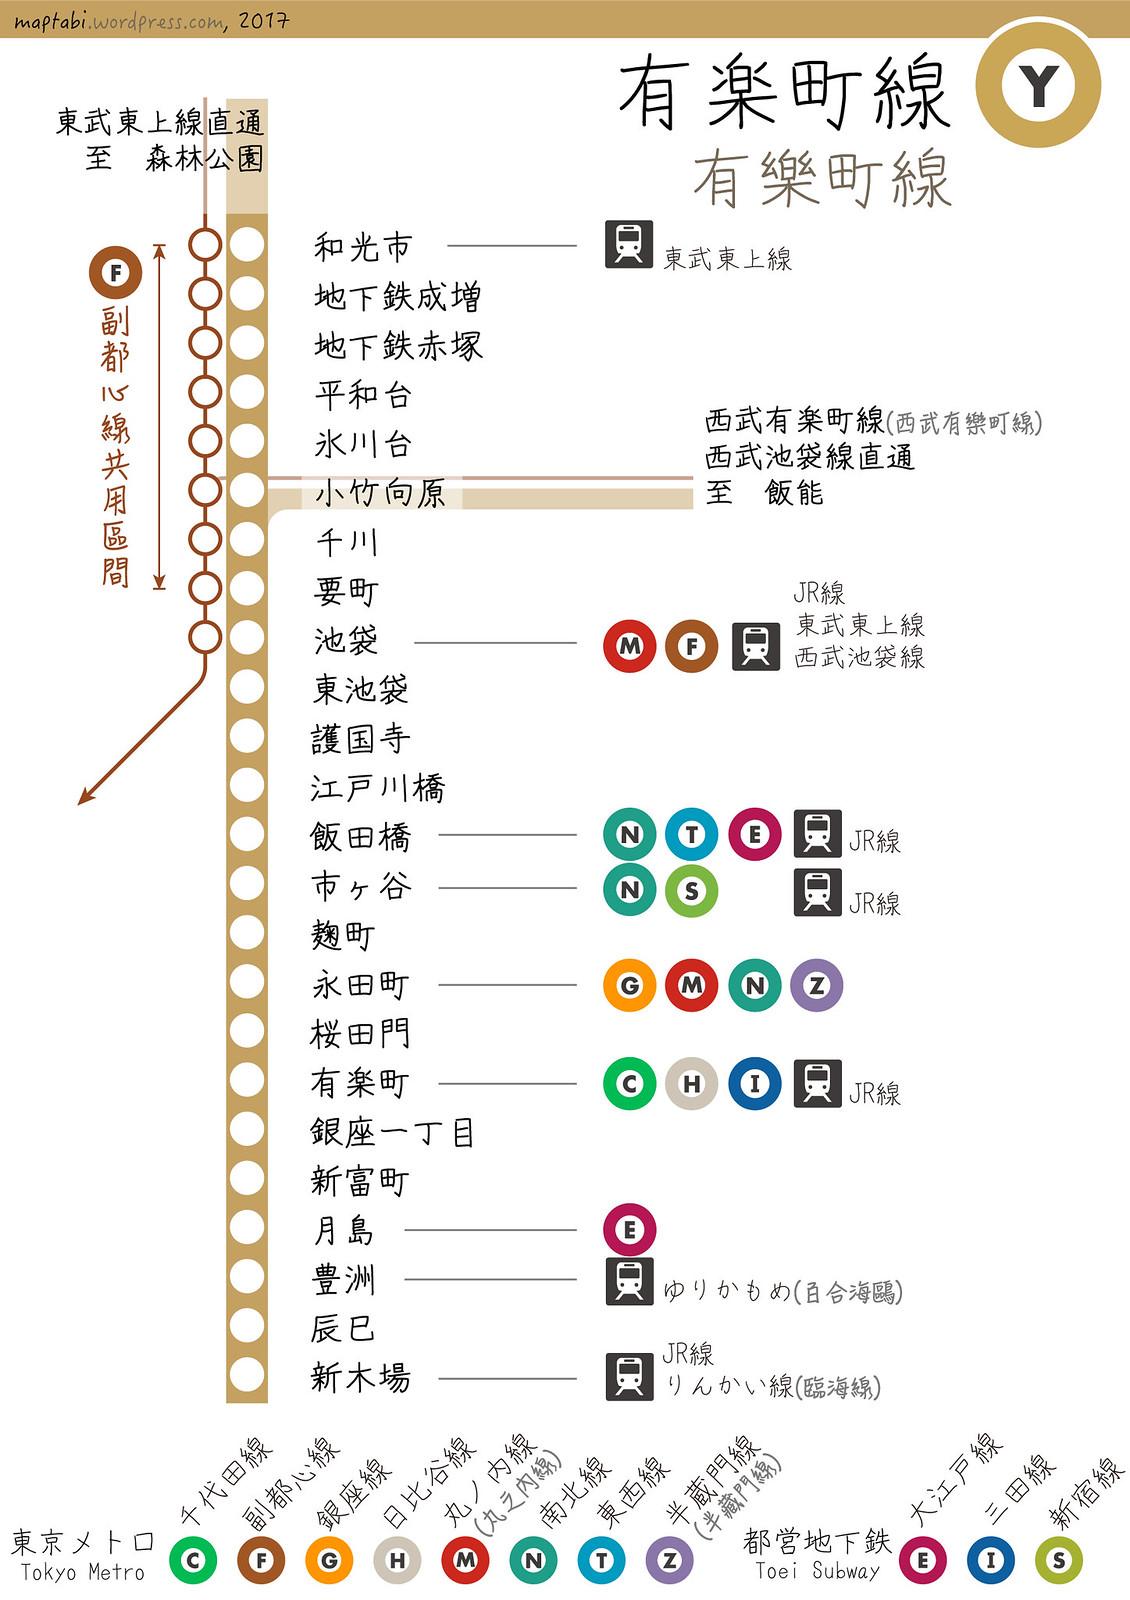 metro_yurakucho_line_detail